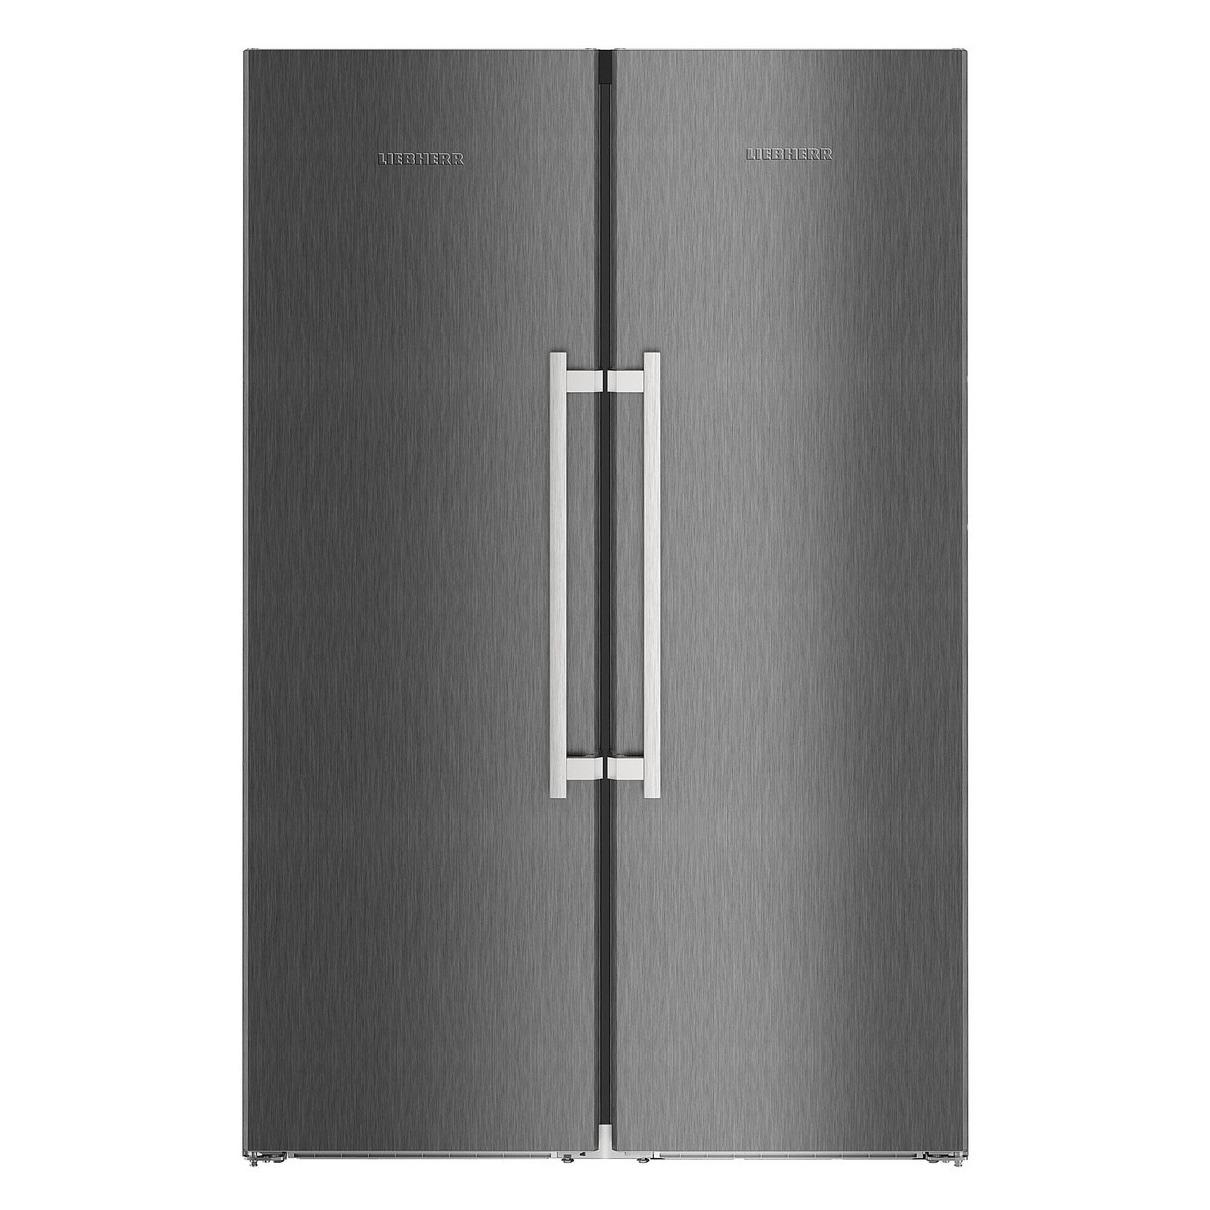 Liebherr amerikaanse koelkast SBSbs 8673-20 - Prijsvergelijk